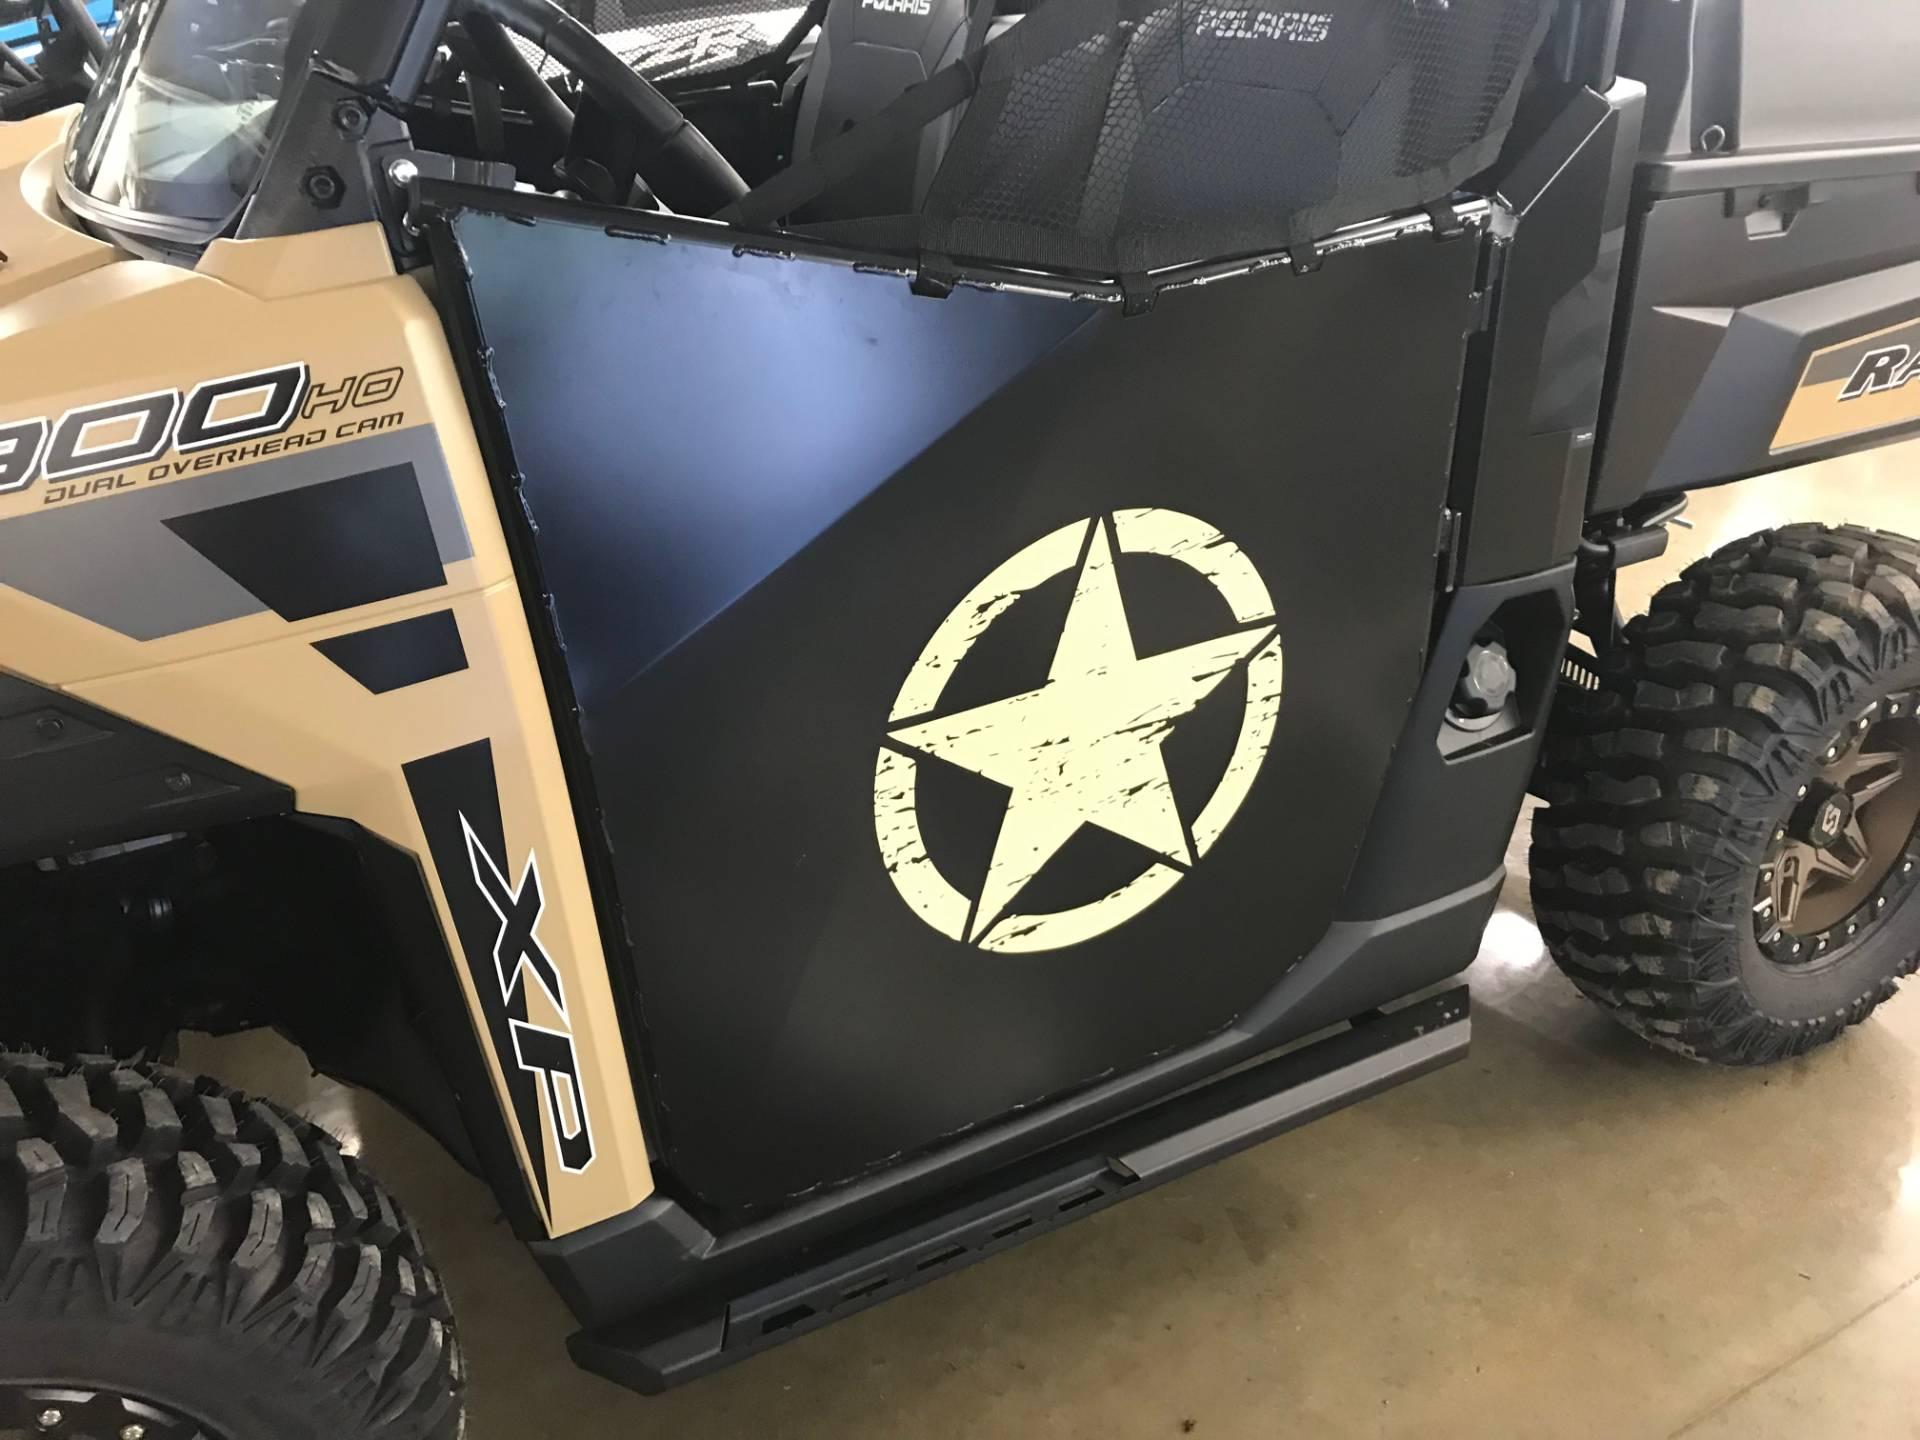 2019 Polaris Ranger XP 900 EPS in Chicora, Pennsylvania